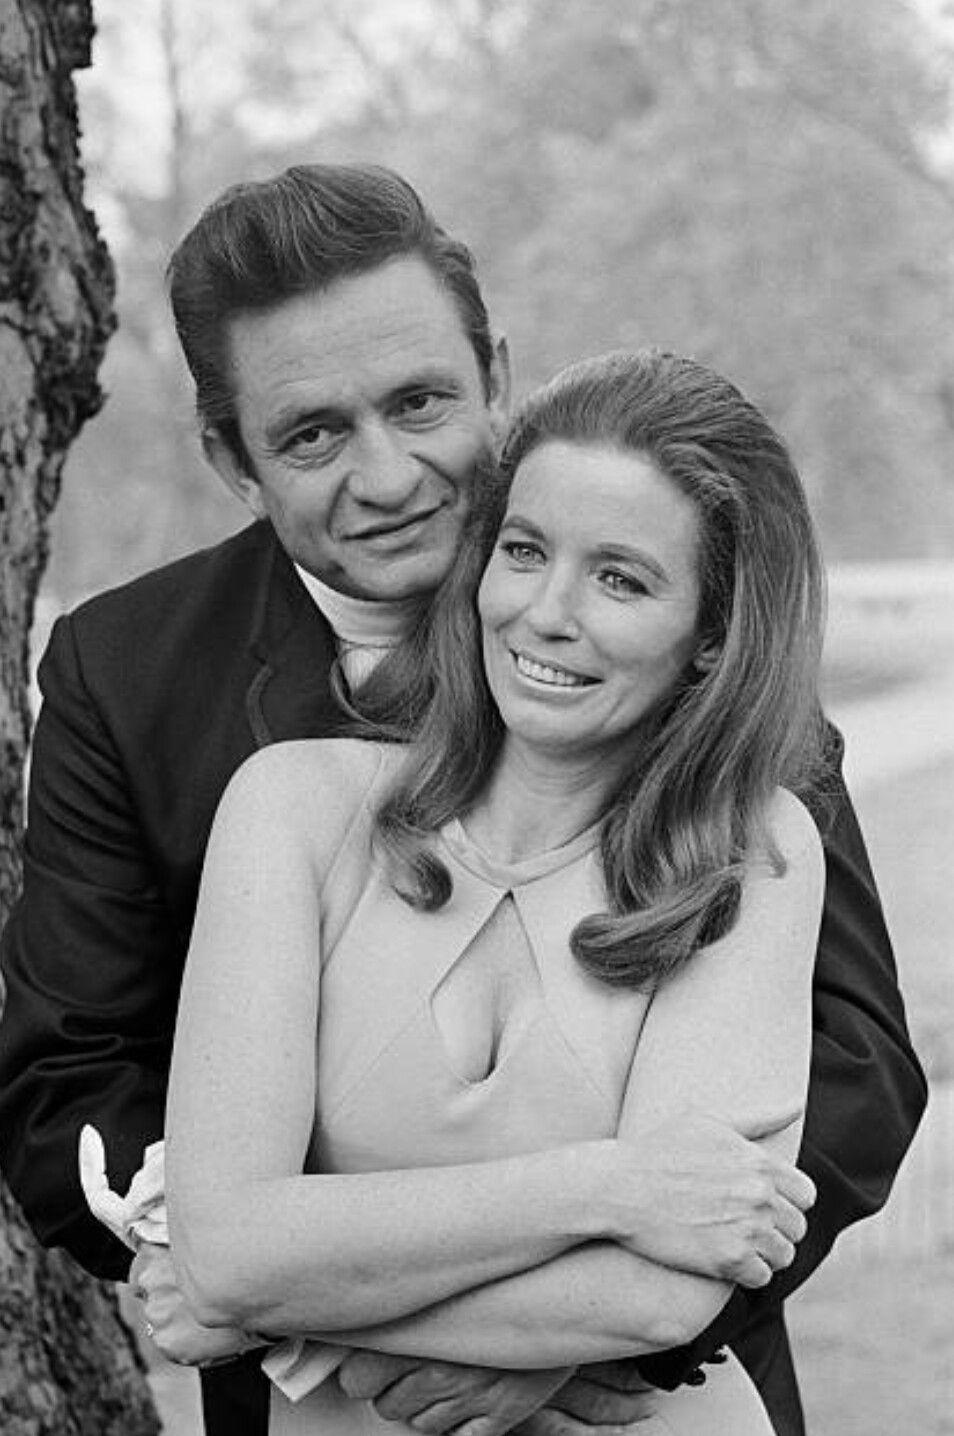 Johnny Cash & June Carter Cash | OPRY MEMBERS in 2019 ...